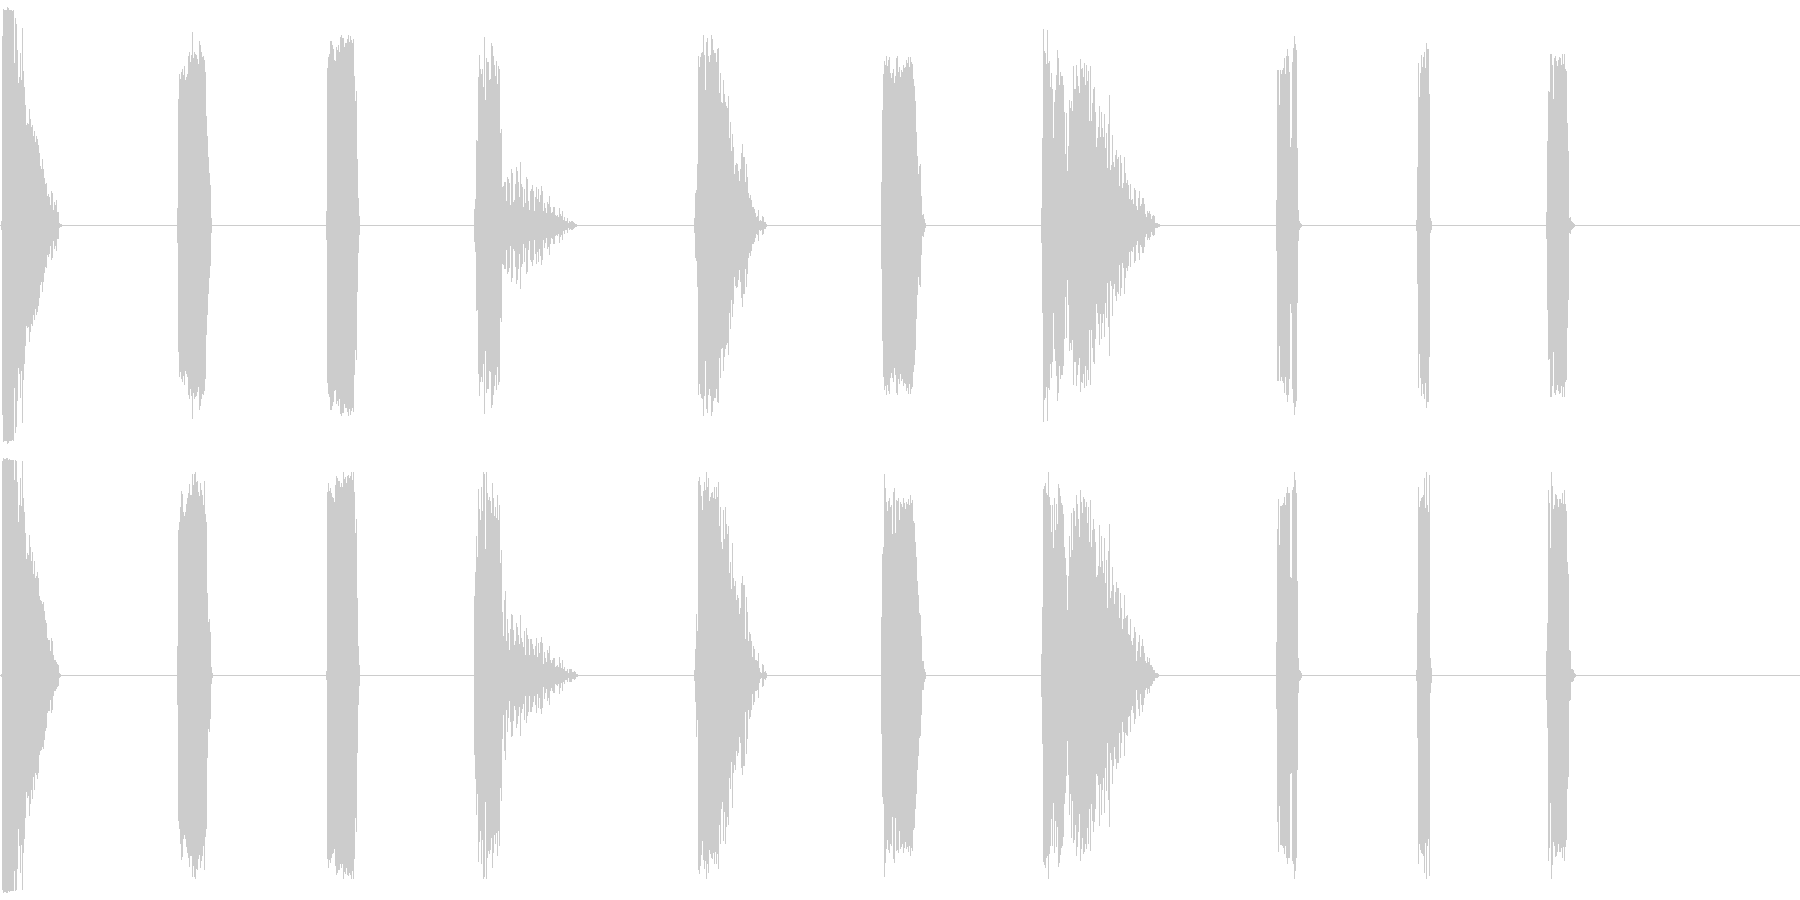 DJレーザーショット11-20の未再生の波形